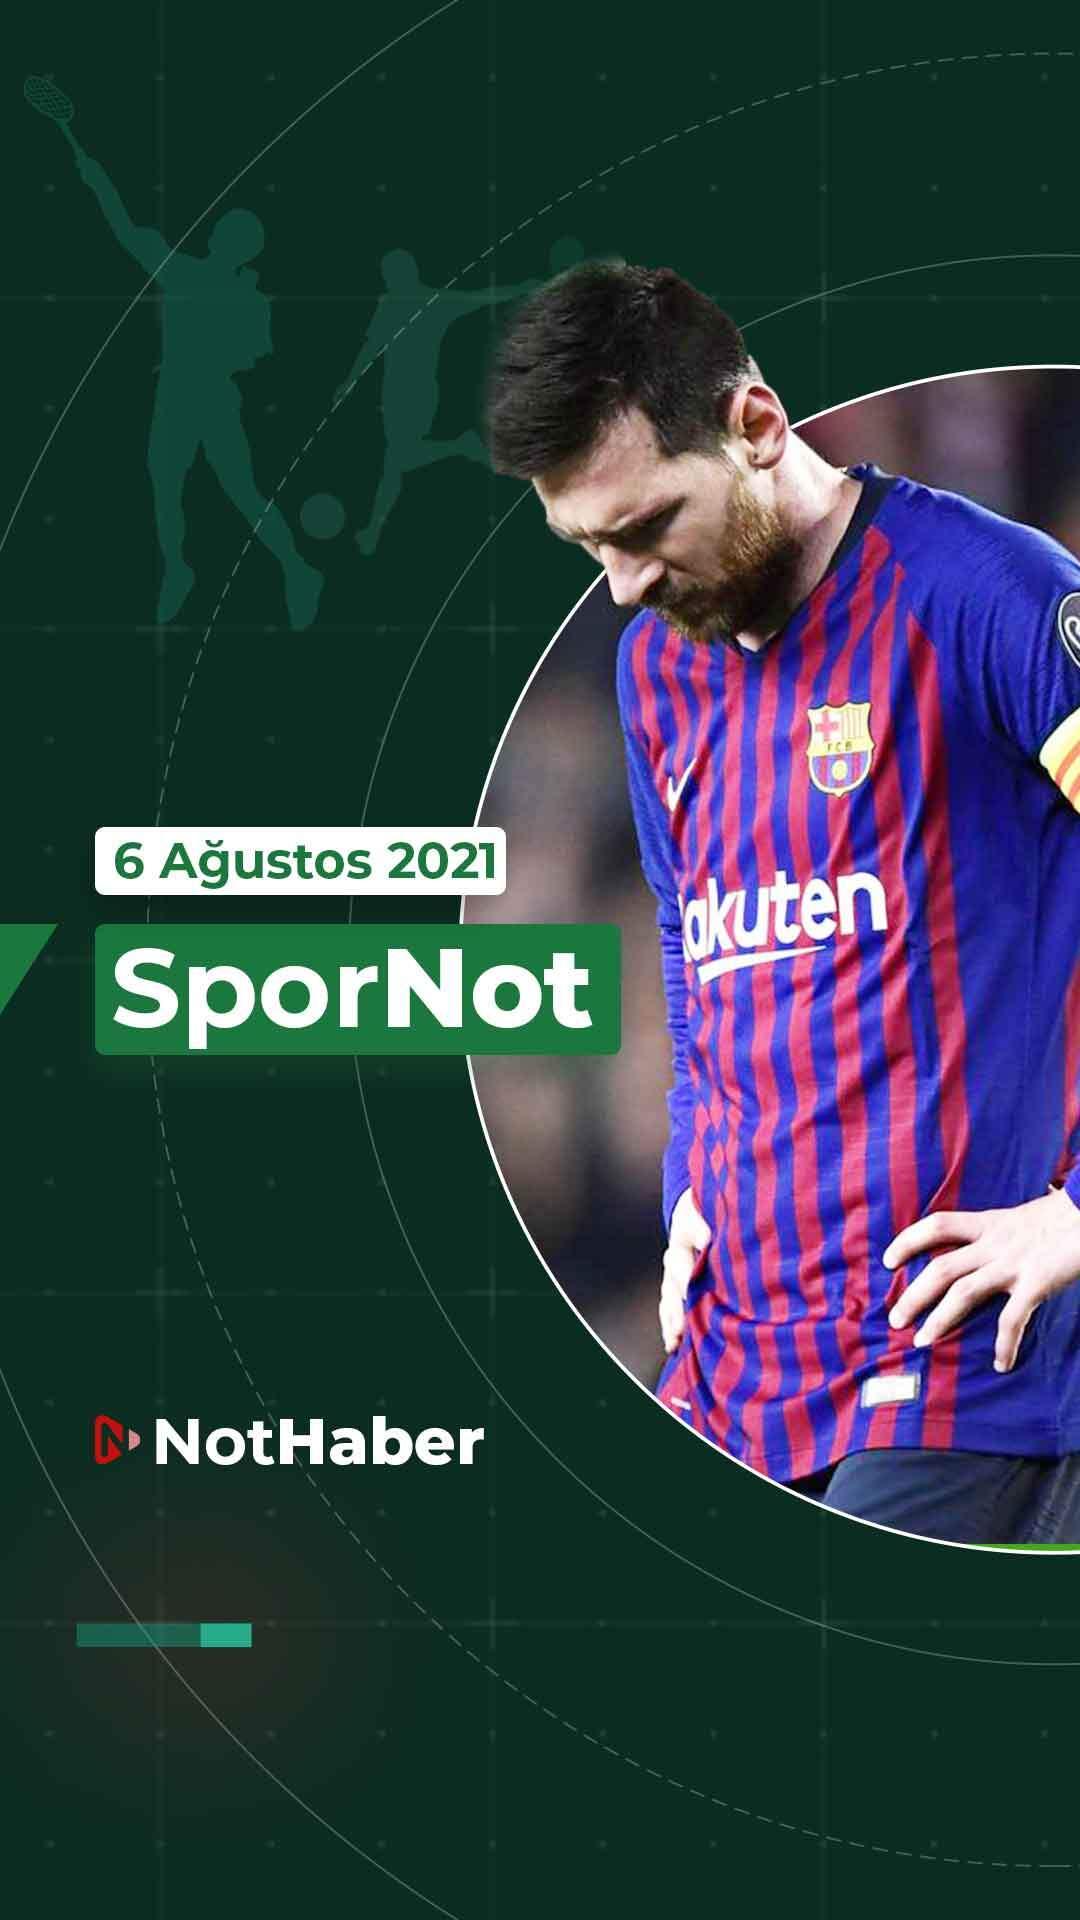 SporNot / Spor Bülteni (6 Ağustos 2021)